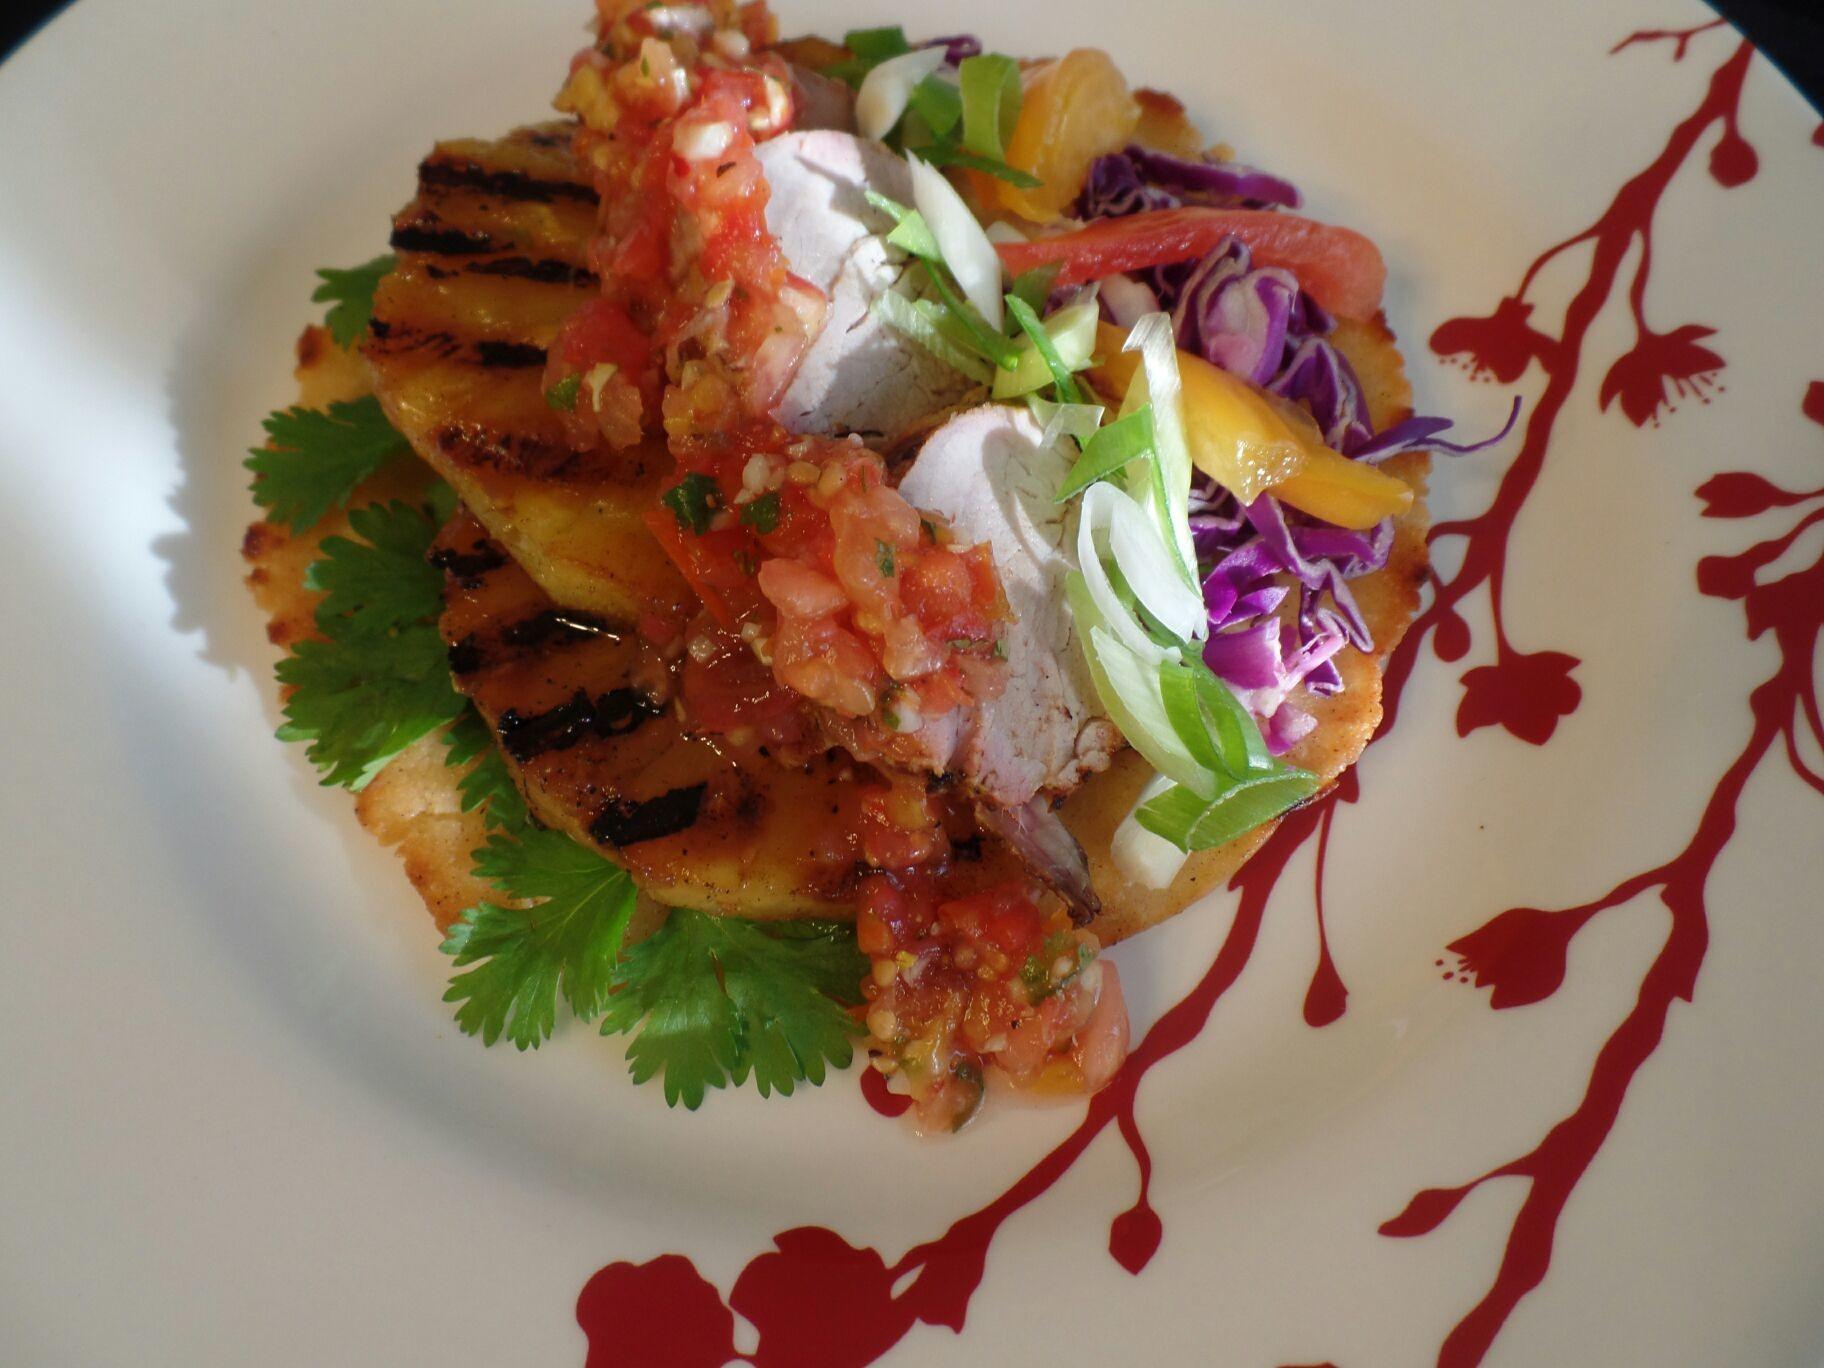 Hawaiian tacos #ilovetacos #tacos #tacotuesday #tacotuesdays #foodpic #foodgasm #foodporn #foodie #foodpedia #foodhunter #foodbloggers #eatwell #eathealthy #healthyeats #healthyfood #healthyeating #healthyfoods #realfood #detroitfoodnetwork #detroitfoodie #detroitfoodies #detroitfood #delish #delicious #deliciousfood #deliciousfoods #deliciousness #instafood #foodnetwork #owntv #wholefoods